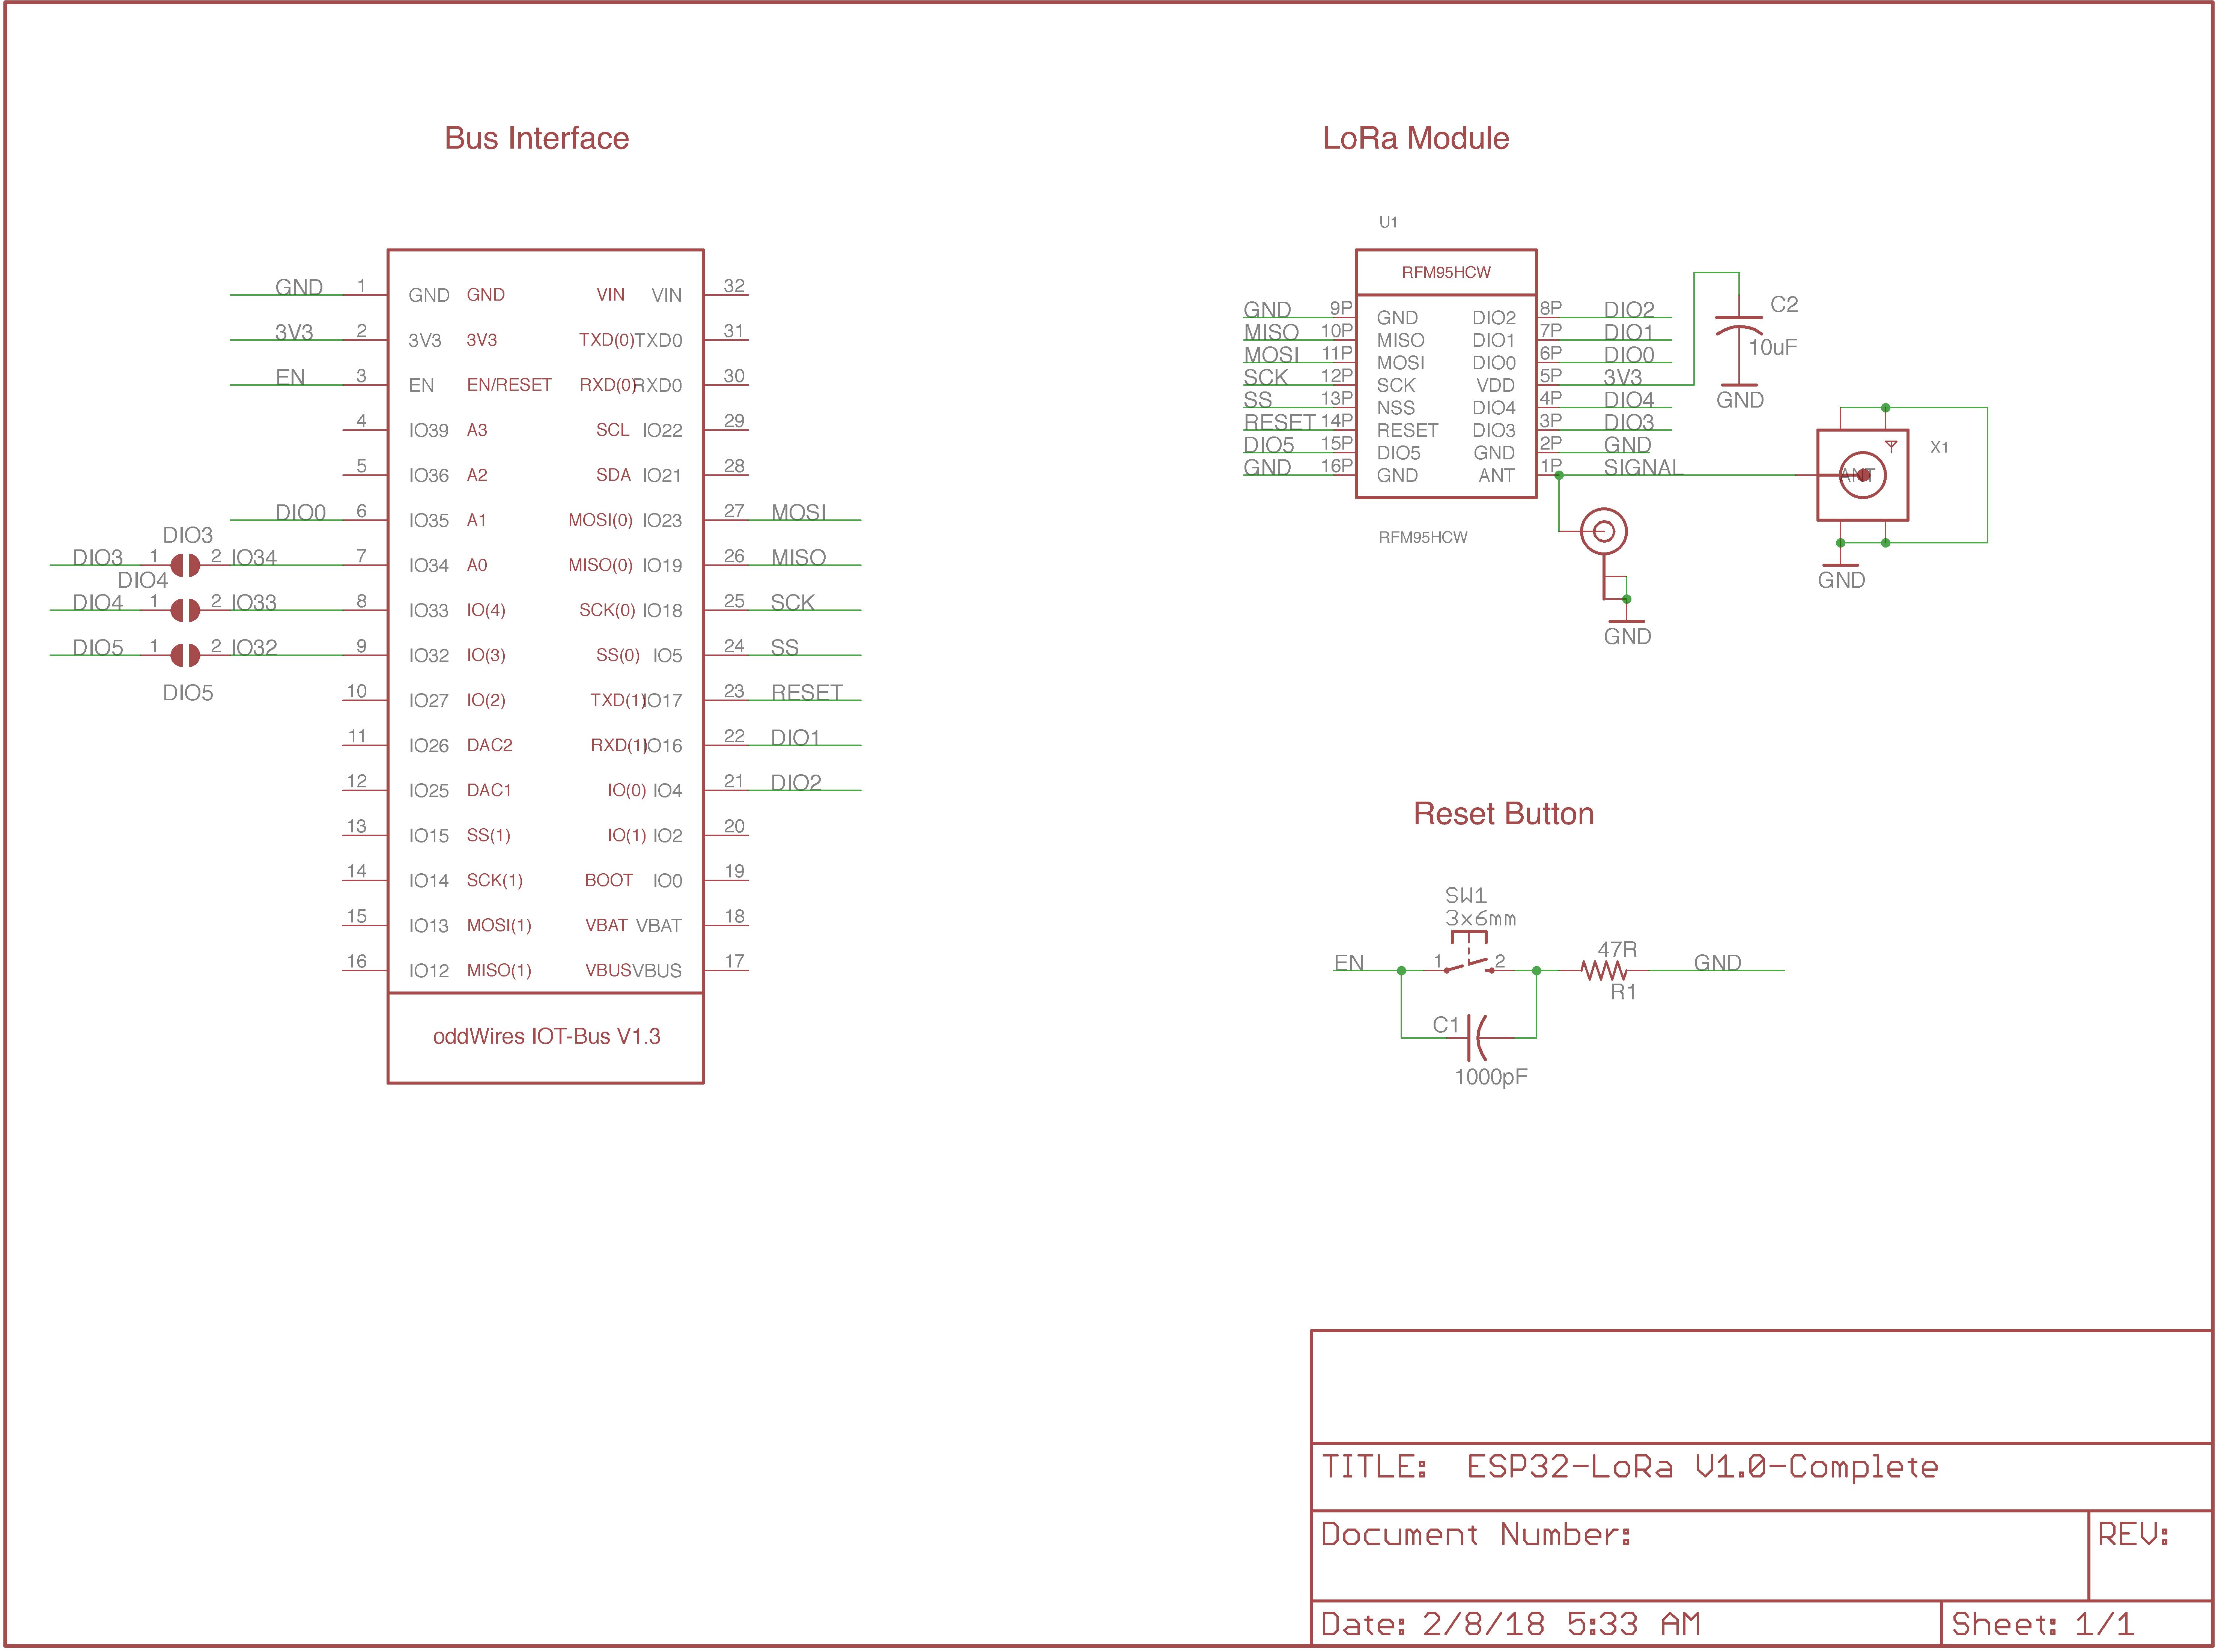 LoRa — iot-bus latest documentation